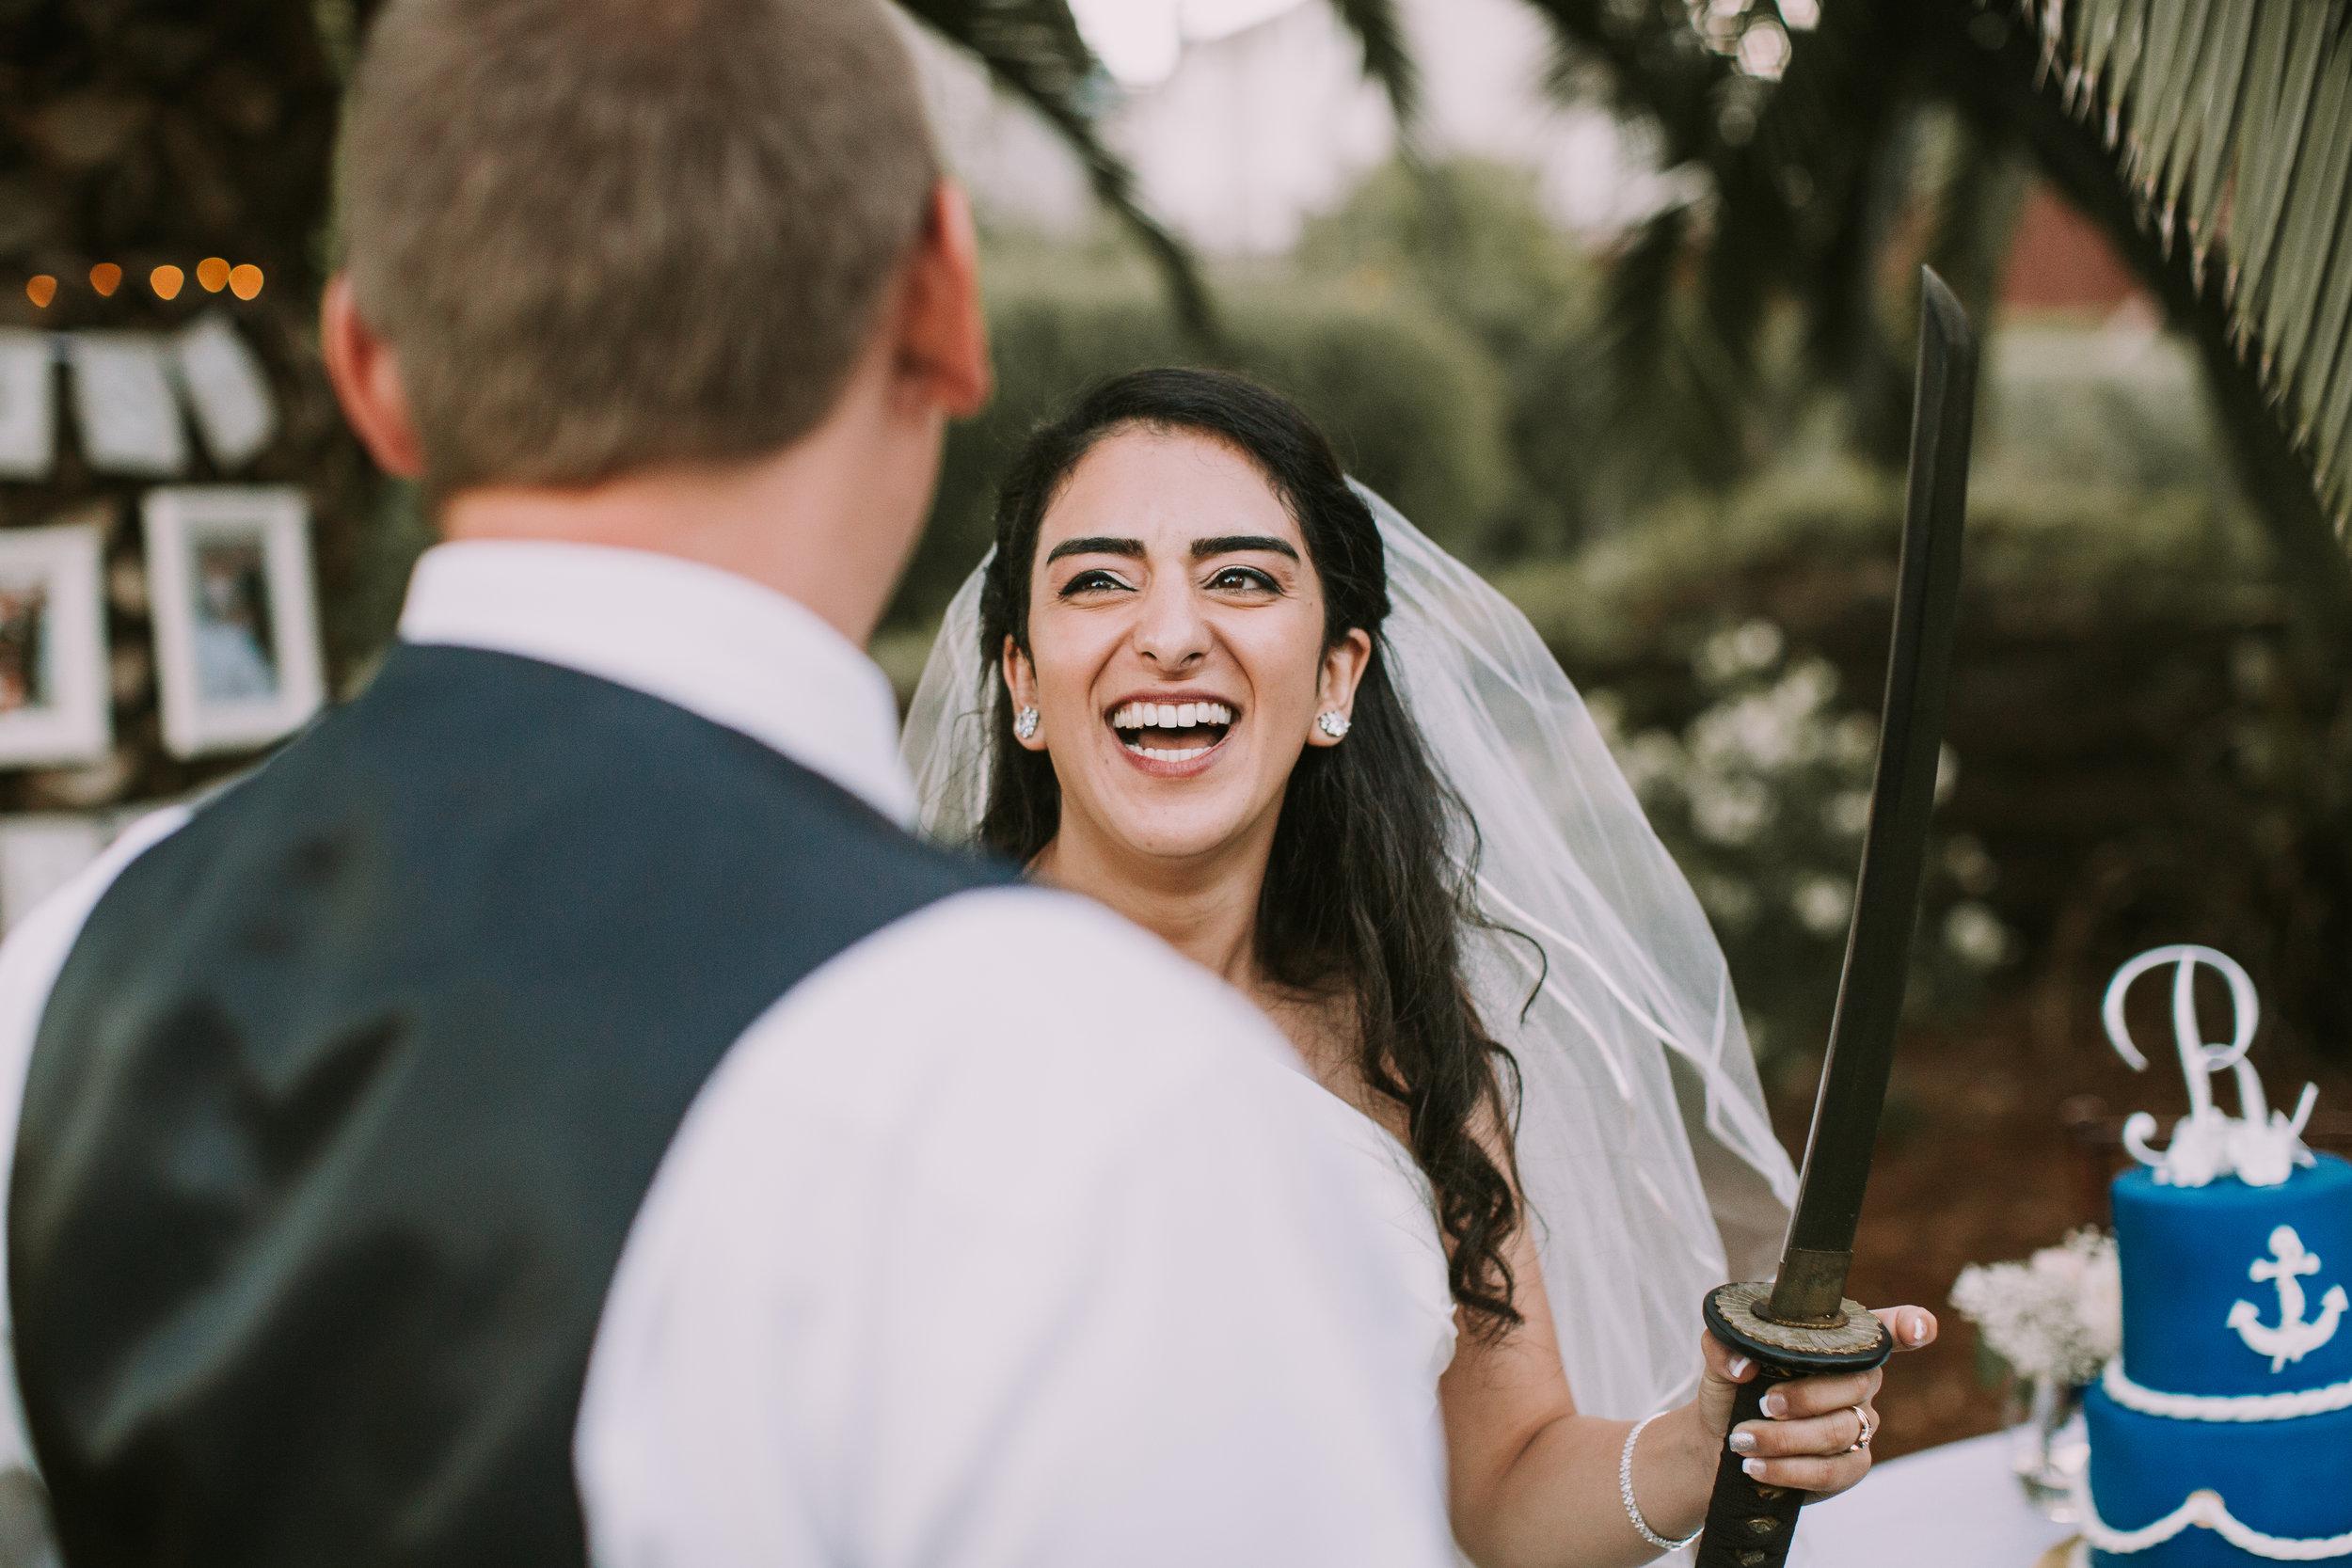 RYDER WEDDING-RYDER WEDDING 2-0141.jpg